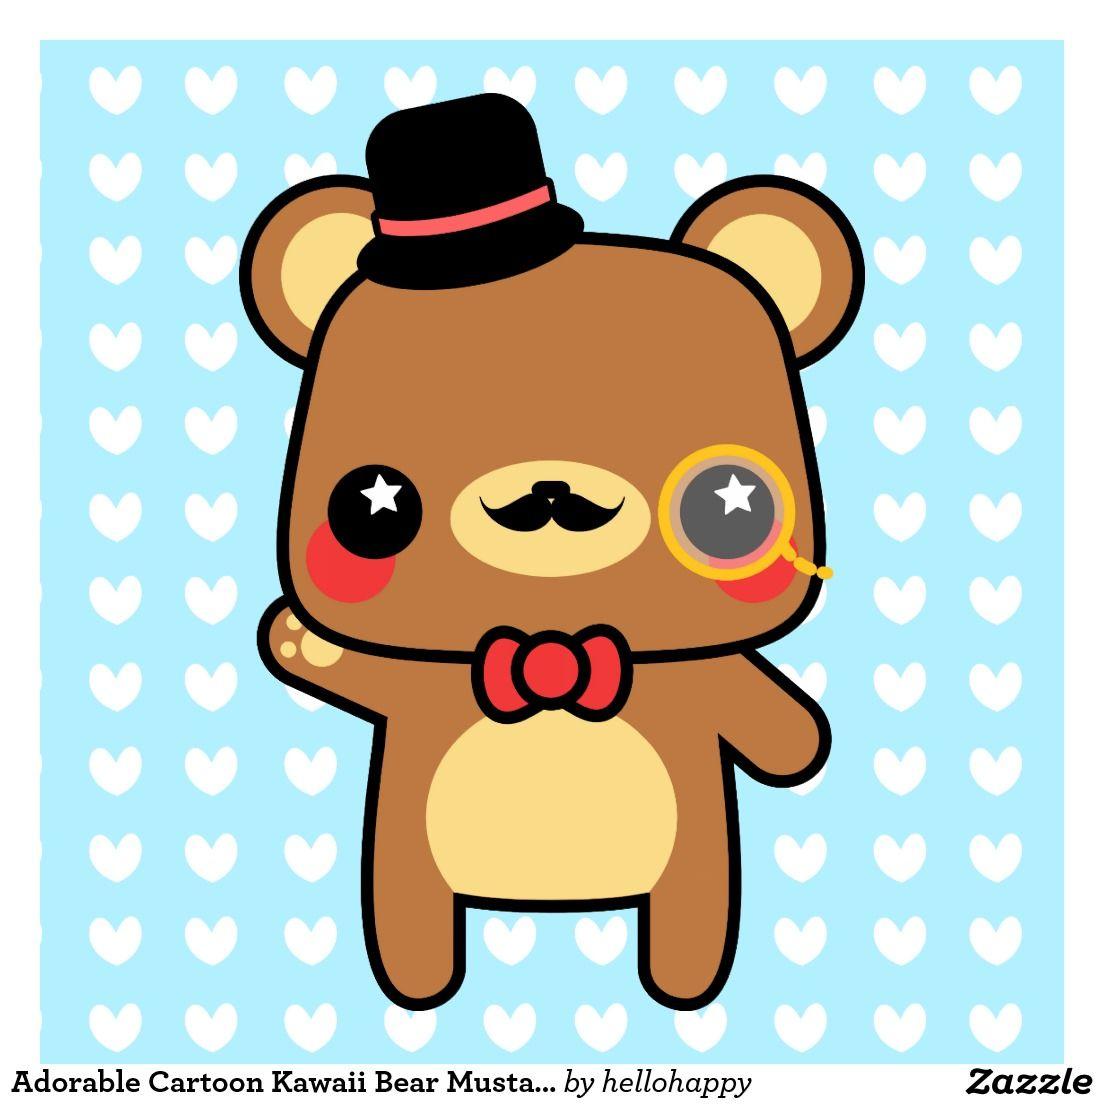 Kawaii Cartoon Bear Art Kawaii Cartoon Bear Paintings Framed Artwork By Kawaii Cartoon Bear Artists Bear Paintings Cute Cartoon Bear Art